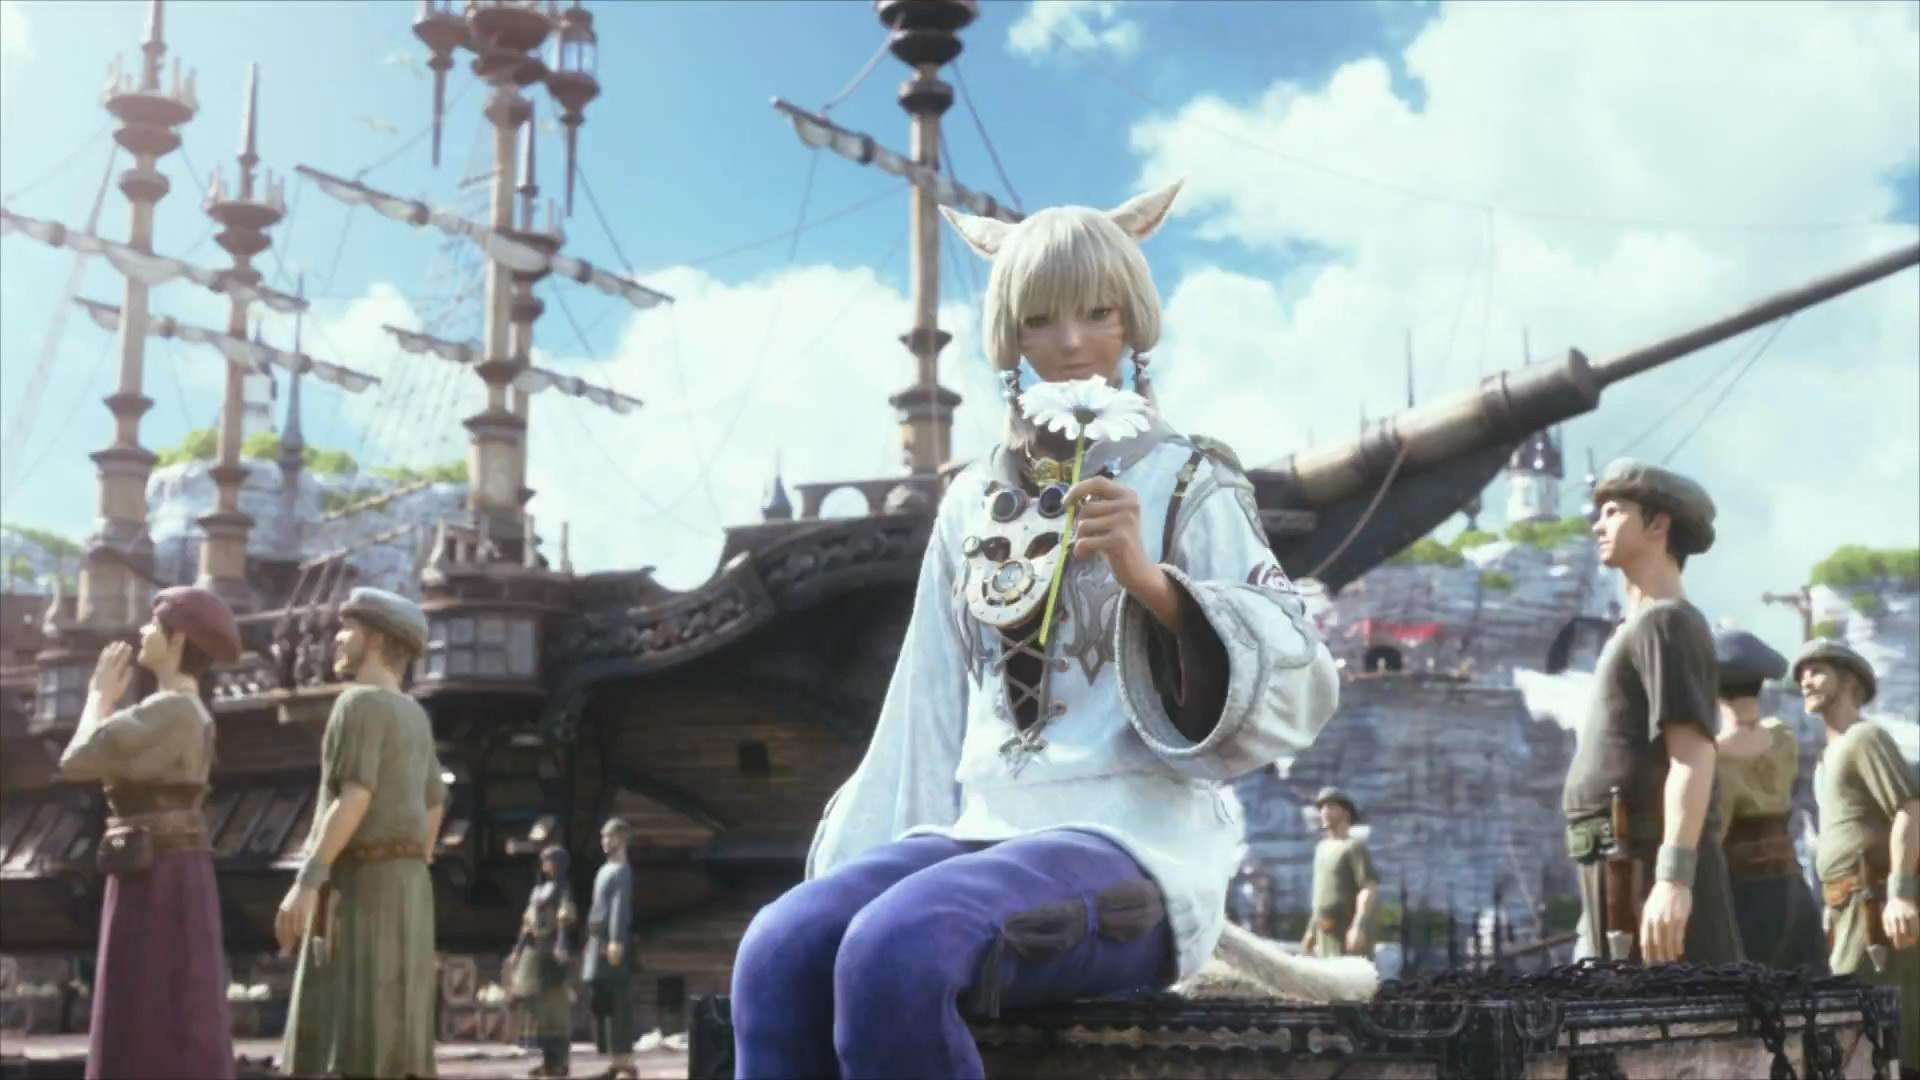 Lightning Returns Wallpaper Hd Final Fantasy Xiv A Realm Reborn Exceeds Square Enix S